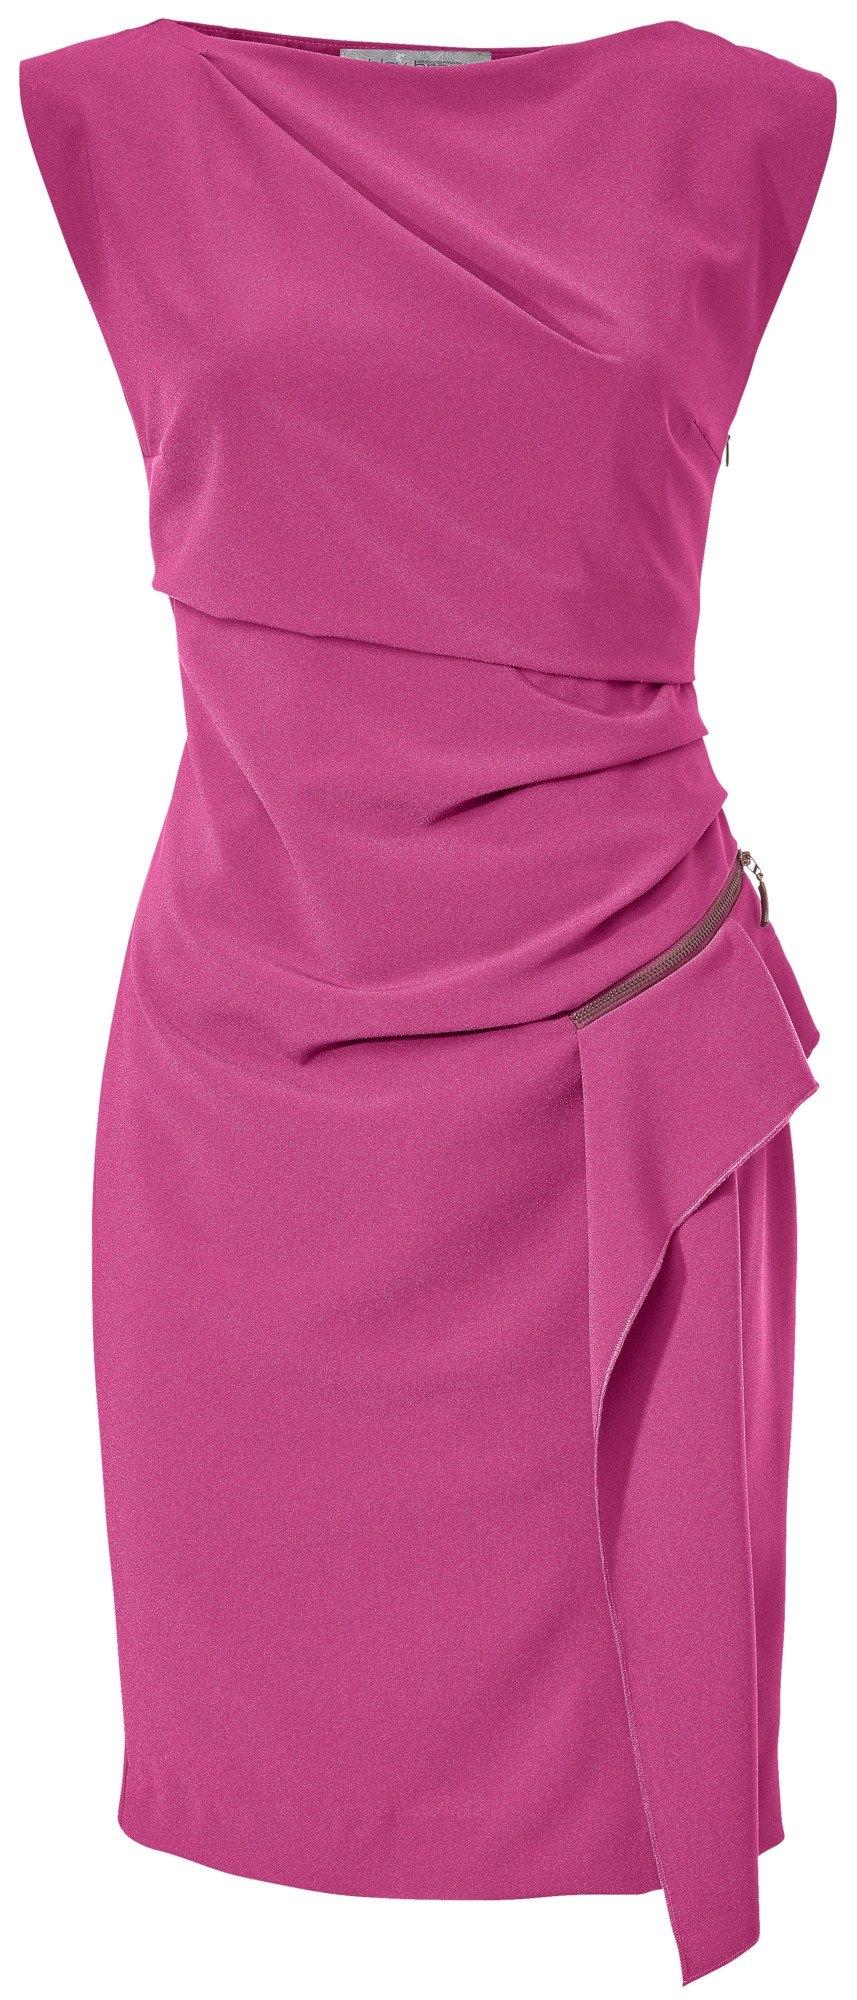 edbf6ee33cabfb Roze Jurken kopen  Bestel je favoriete jurk online